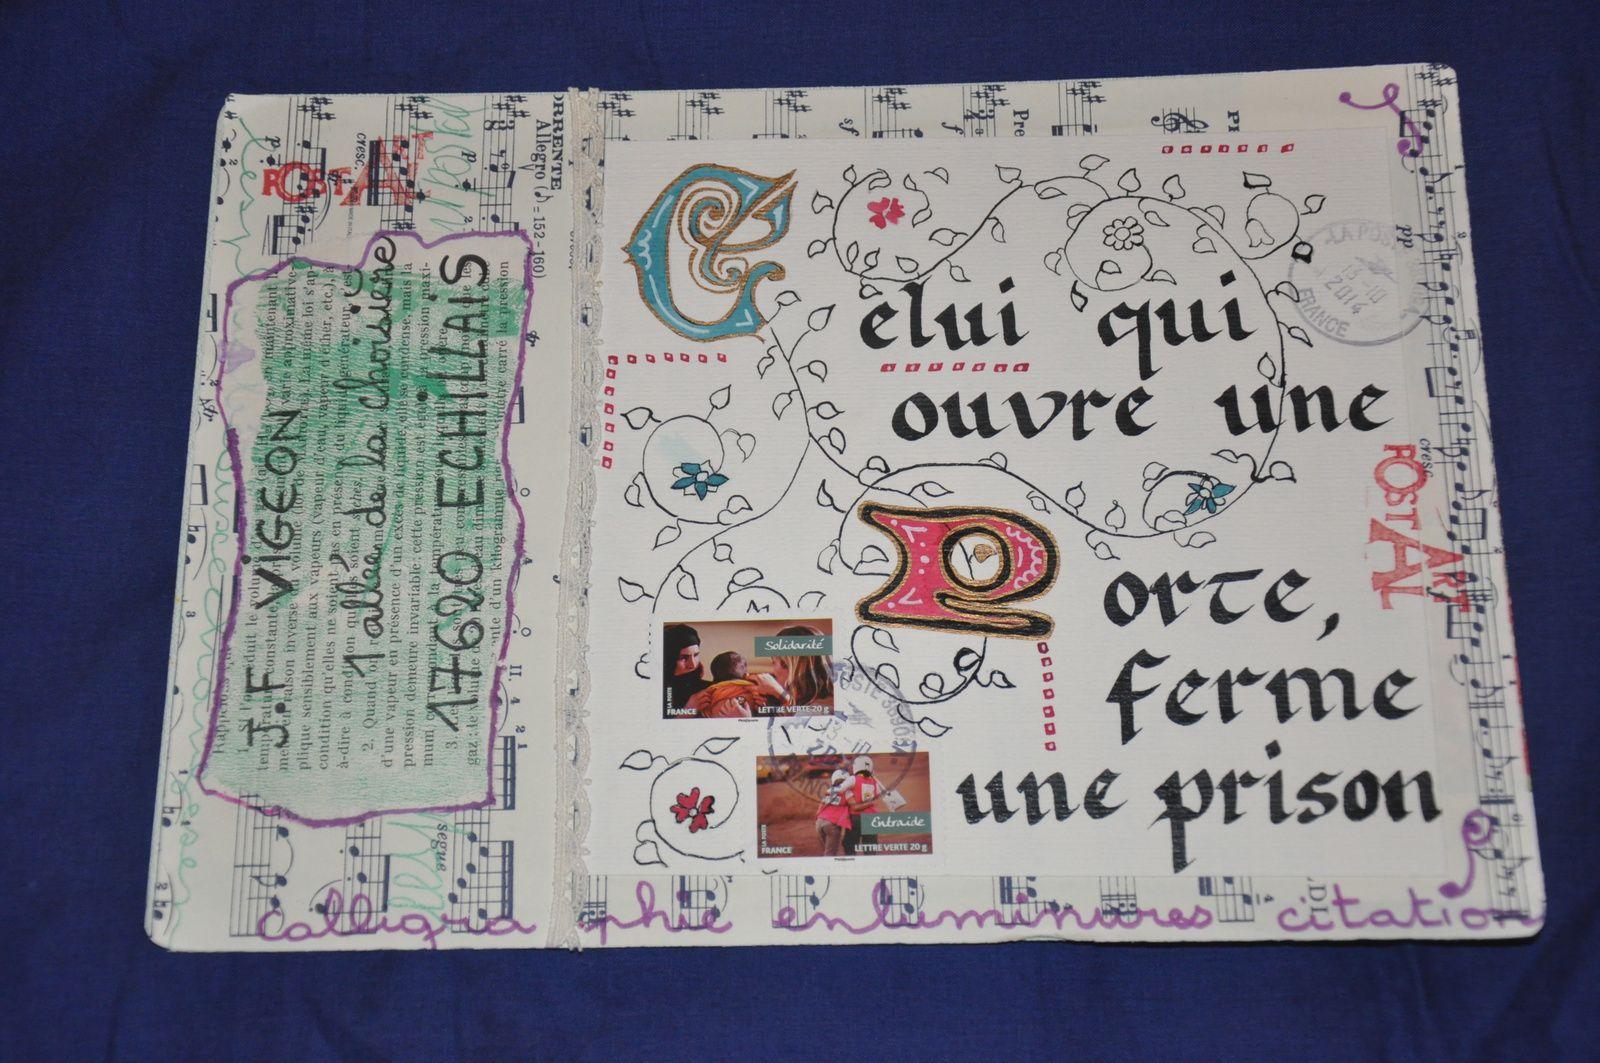 Merci à Annick Serpault pour cette magnifique calligraphie enluminée! J'adoooooooooore!